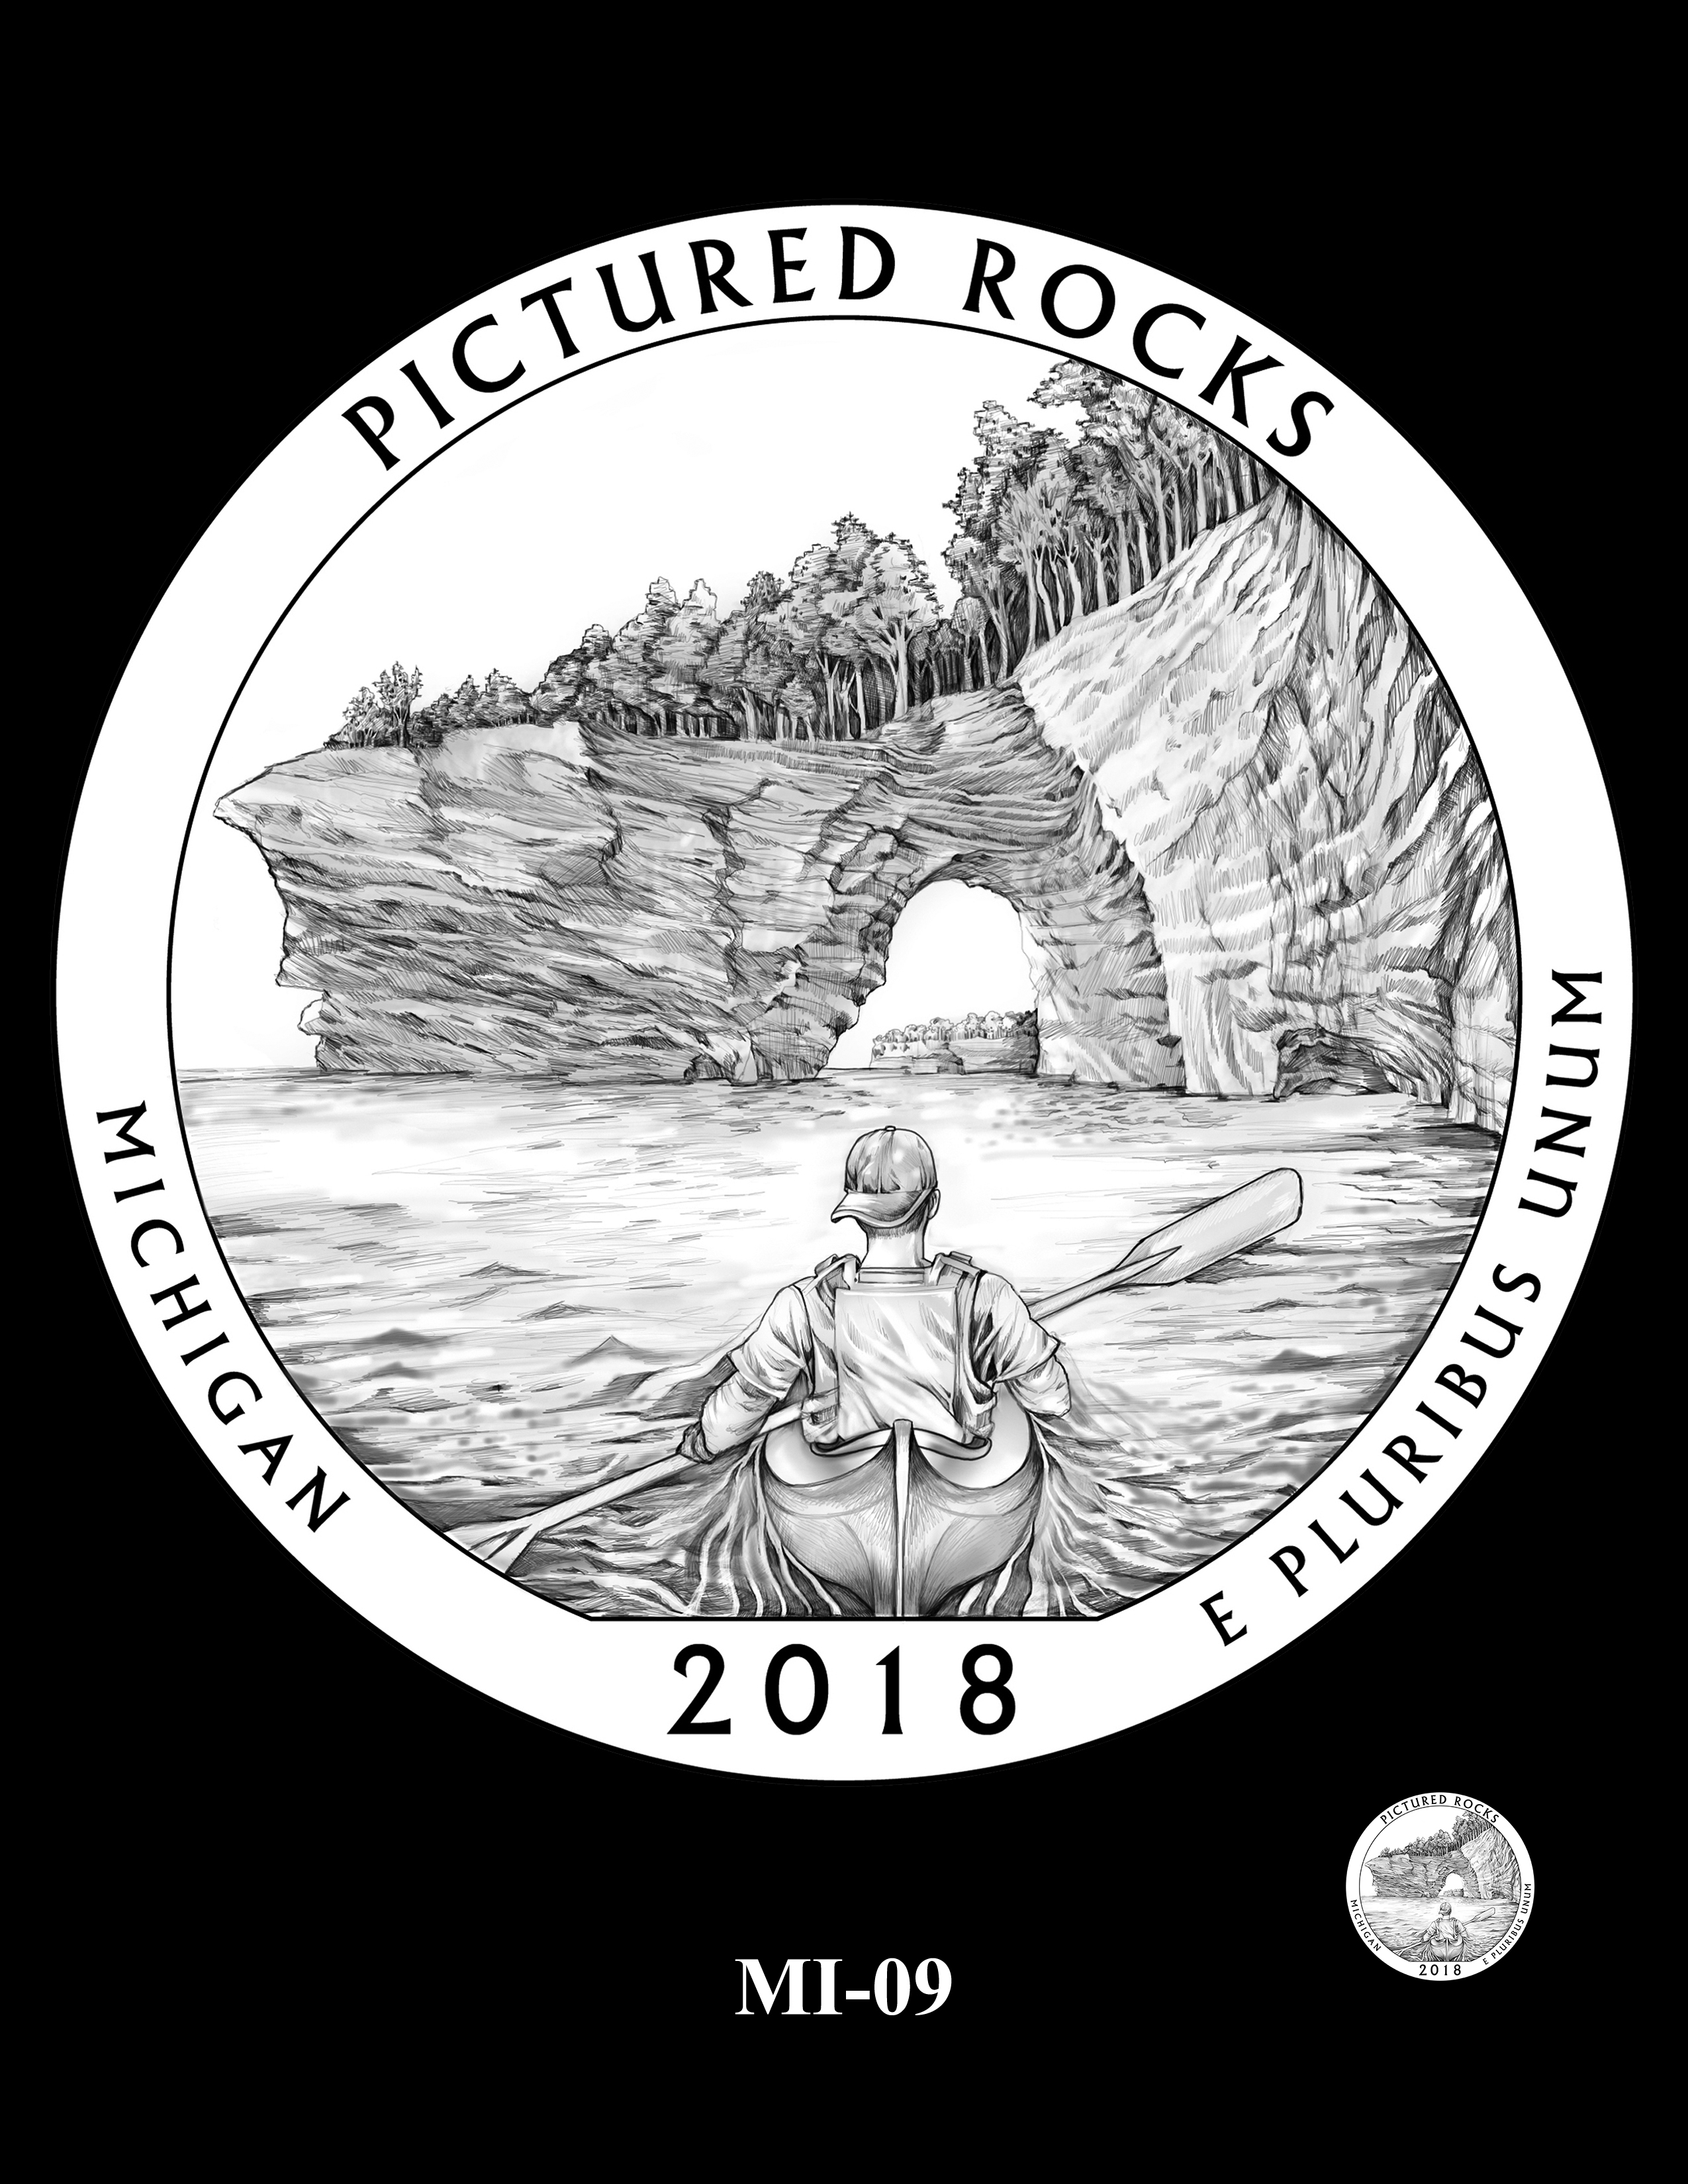 MI-09 -- 2018 America the Beautiful® Quarters Program